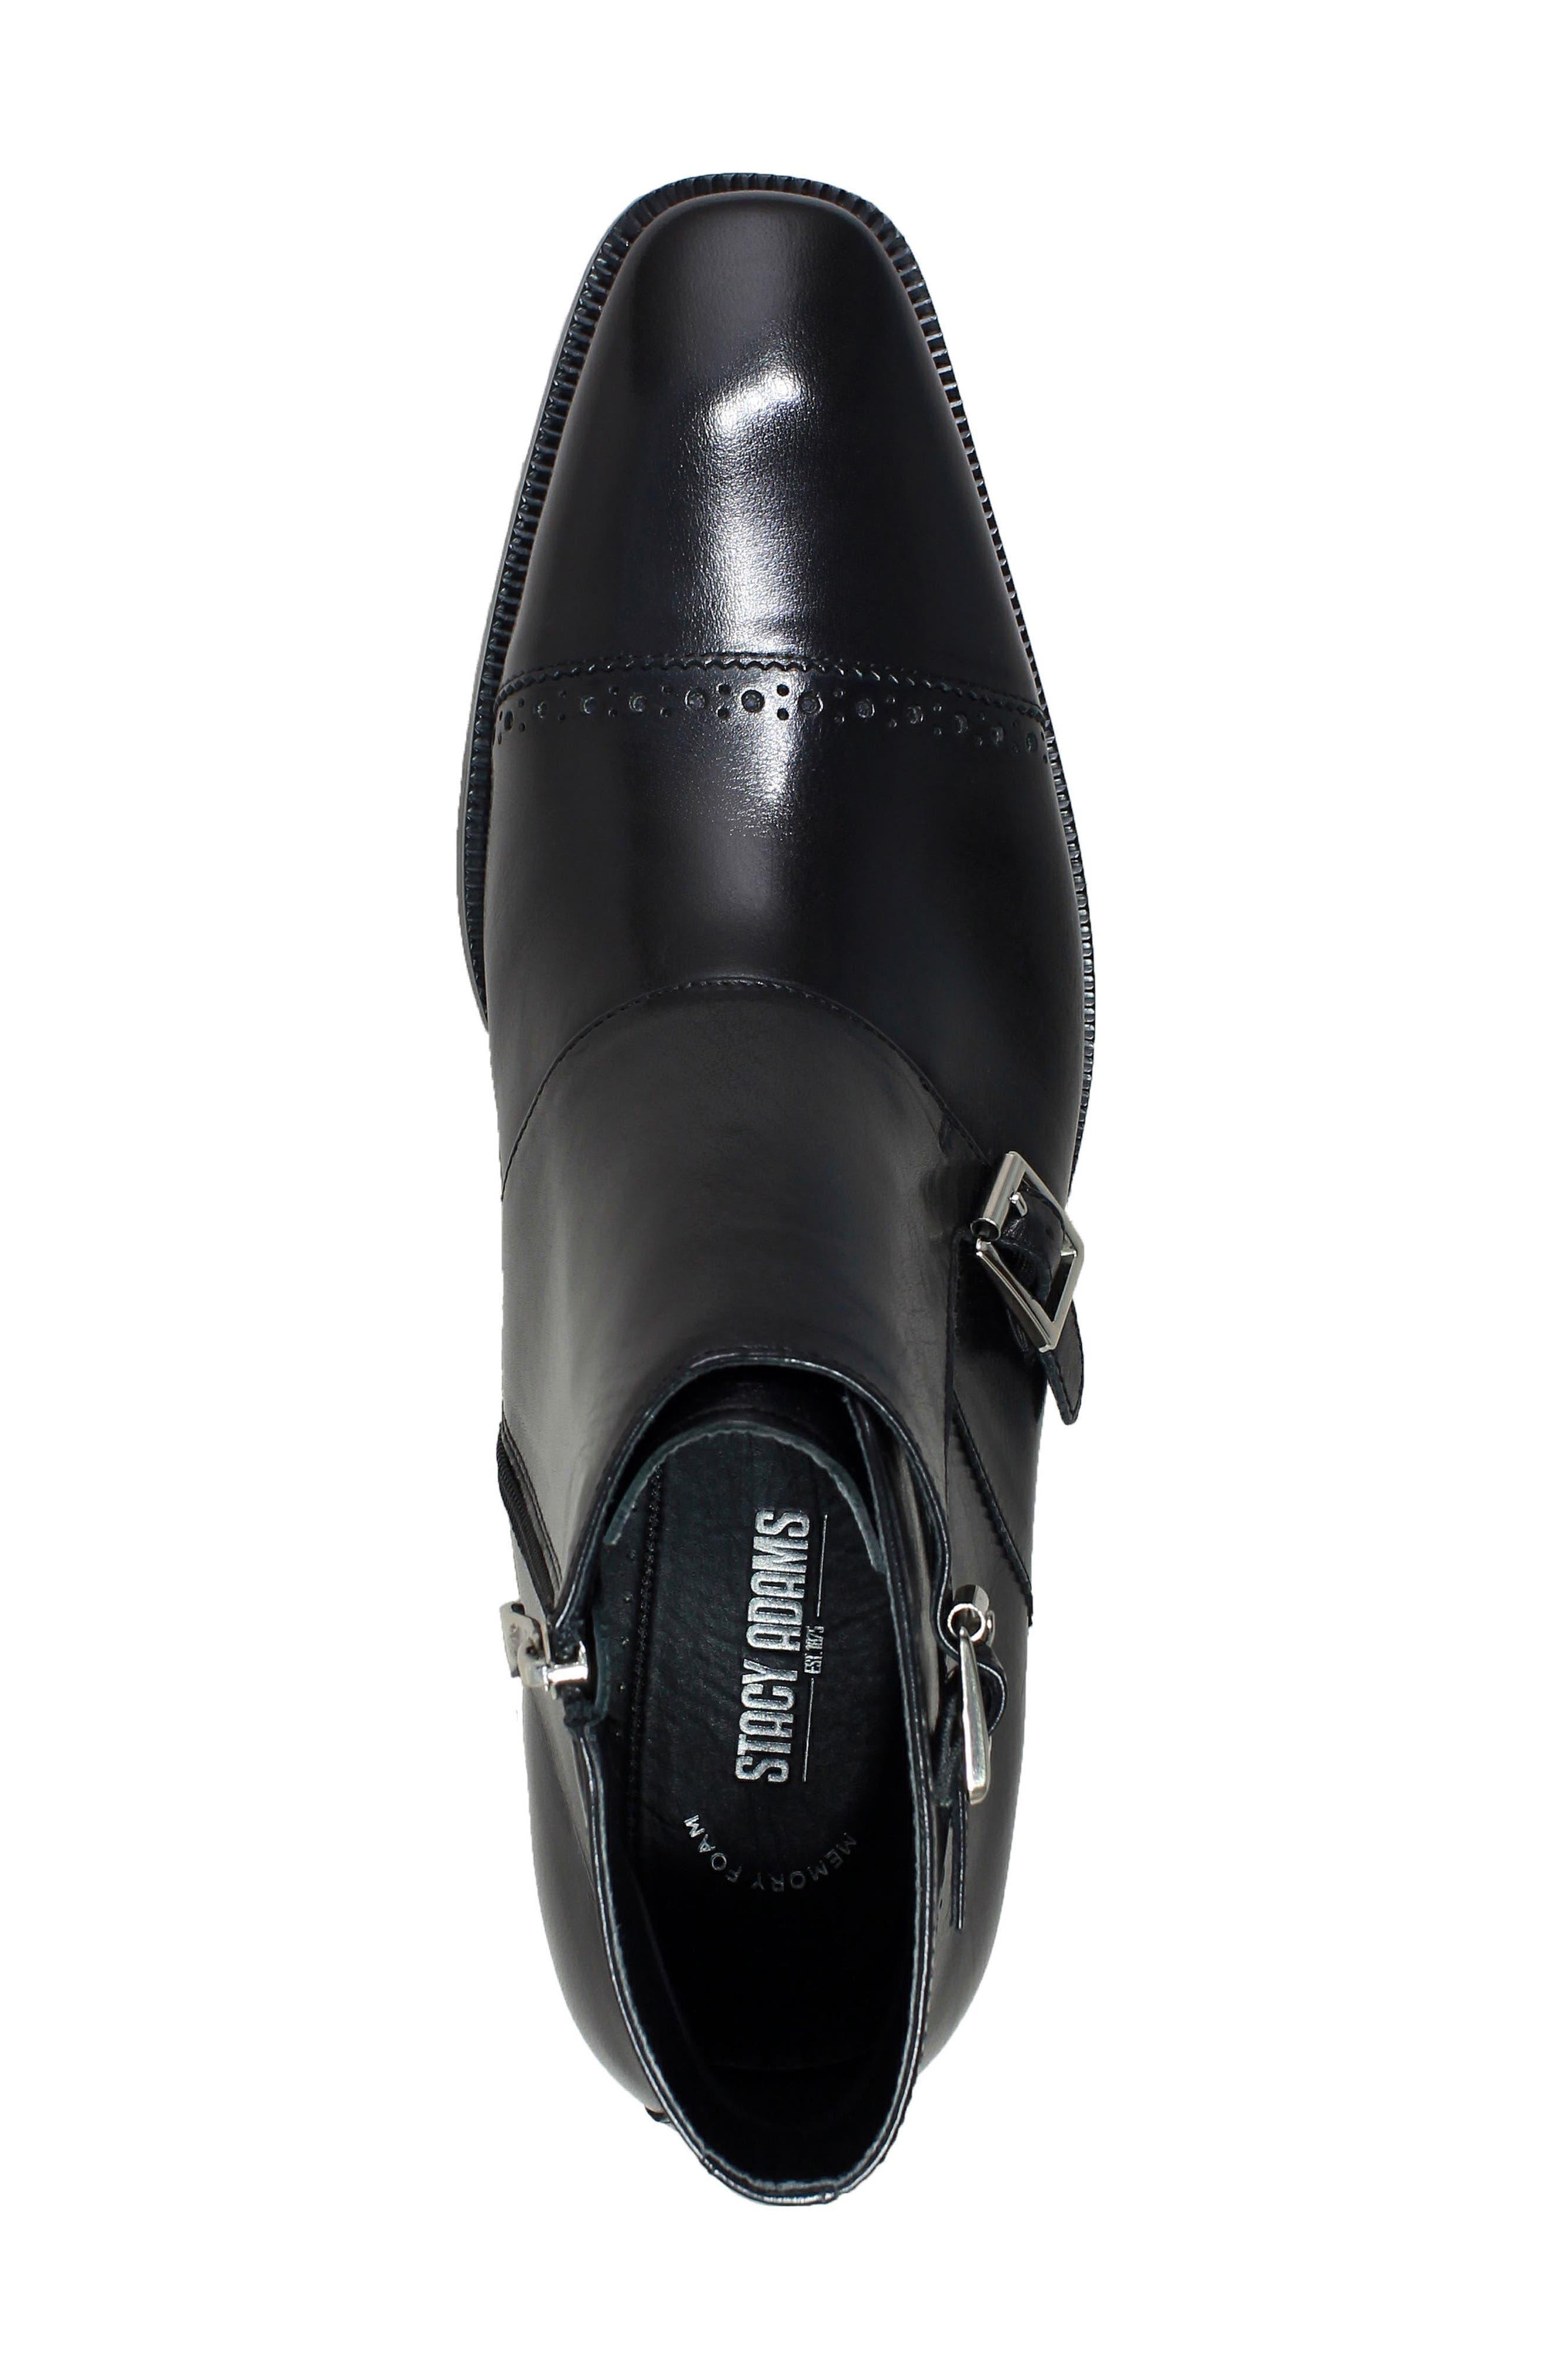 Kason Double Monk Strap Boot,                             Alternate thumbnail 4, color,                             Black Leather